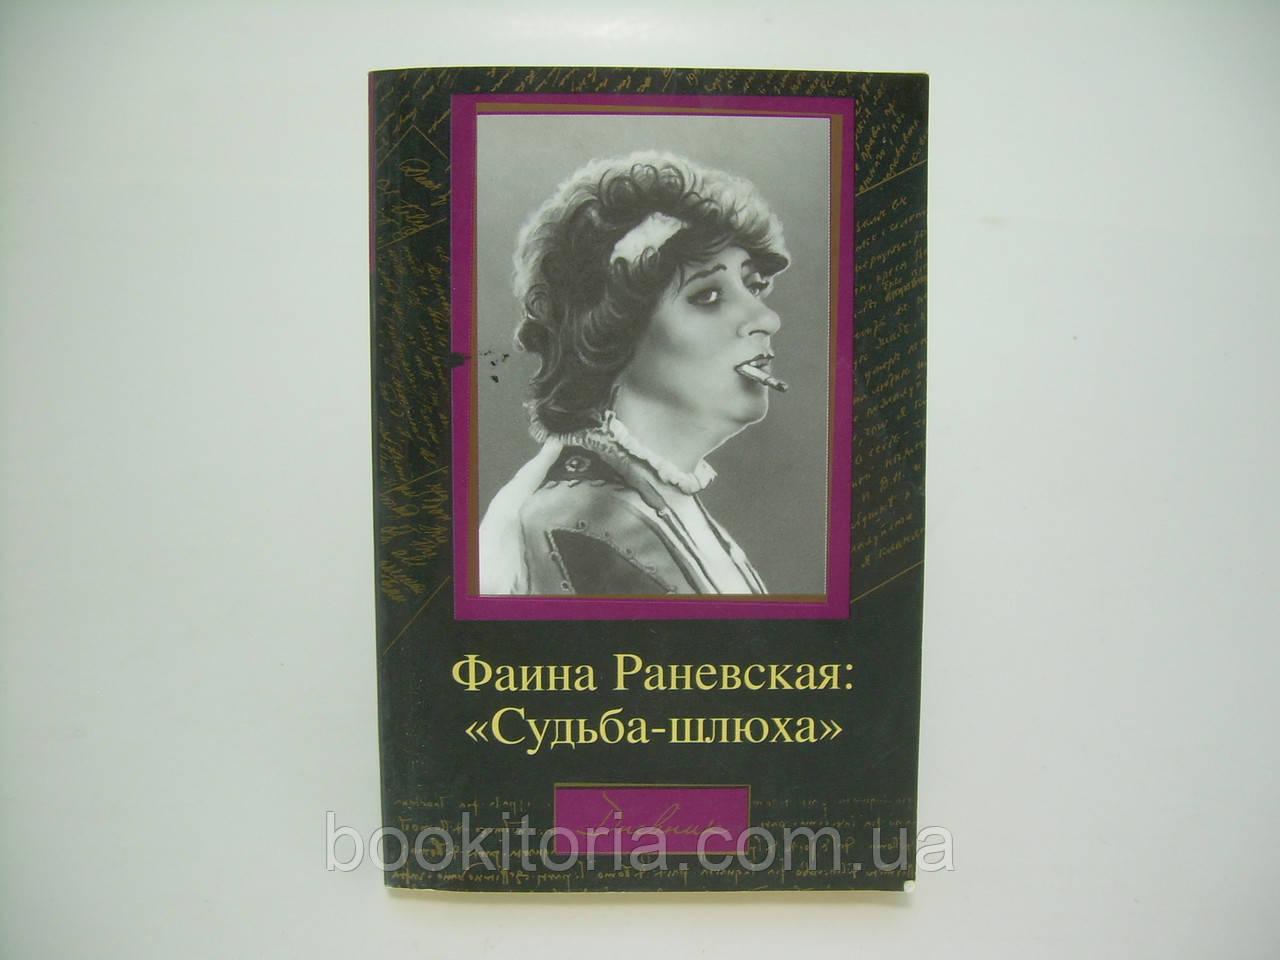 Раневская Ф. Судьба-шлюха (б/у).